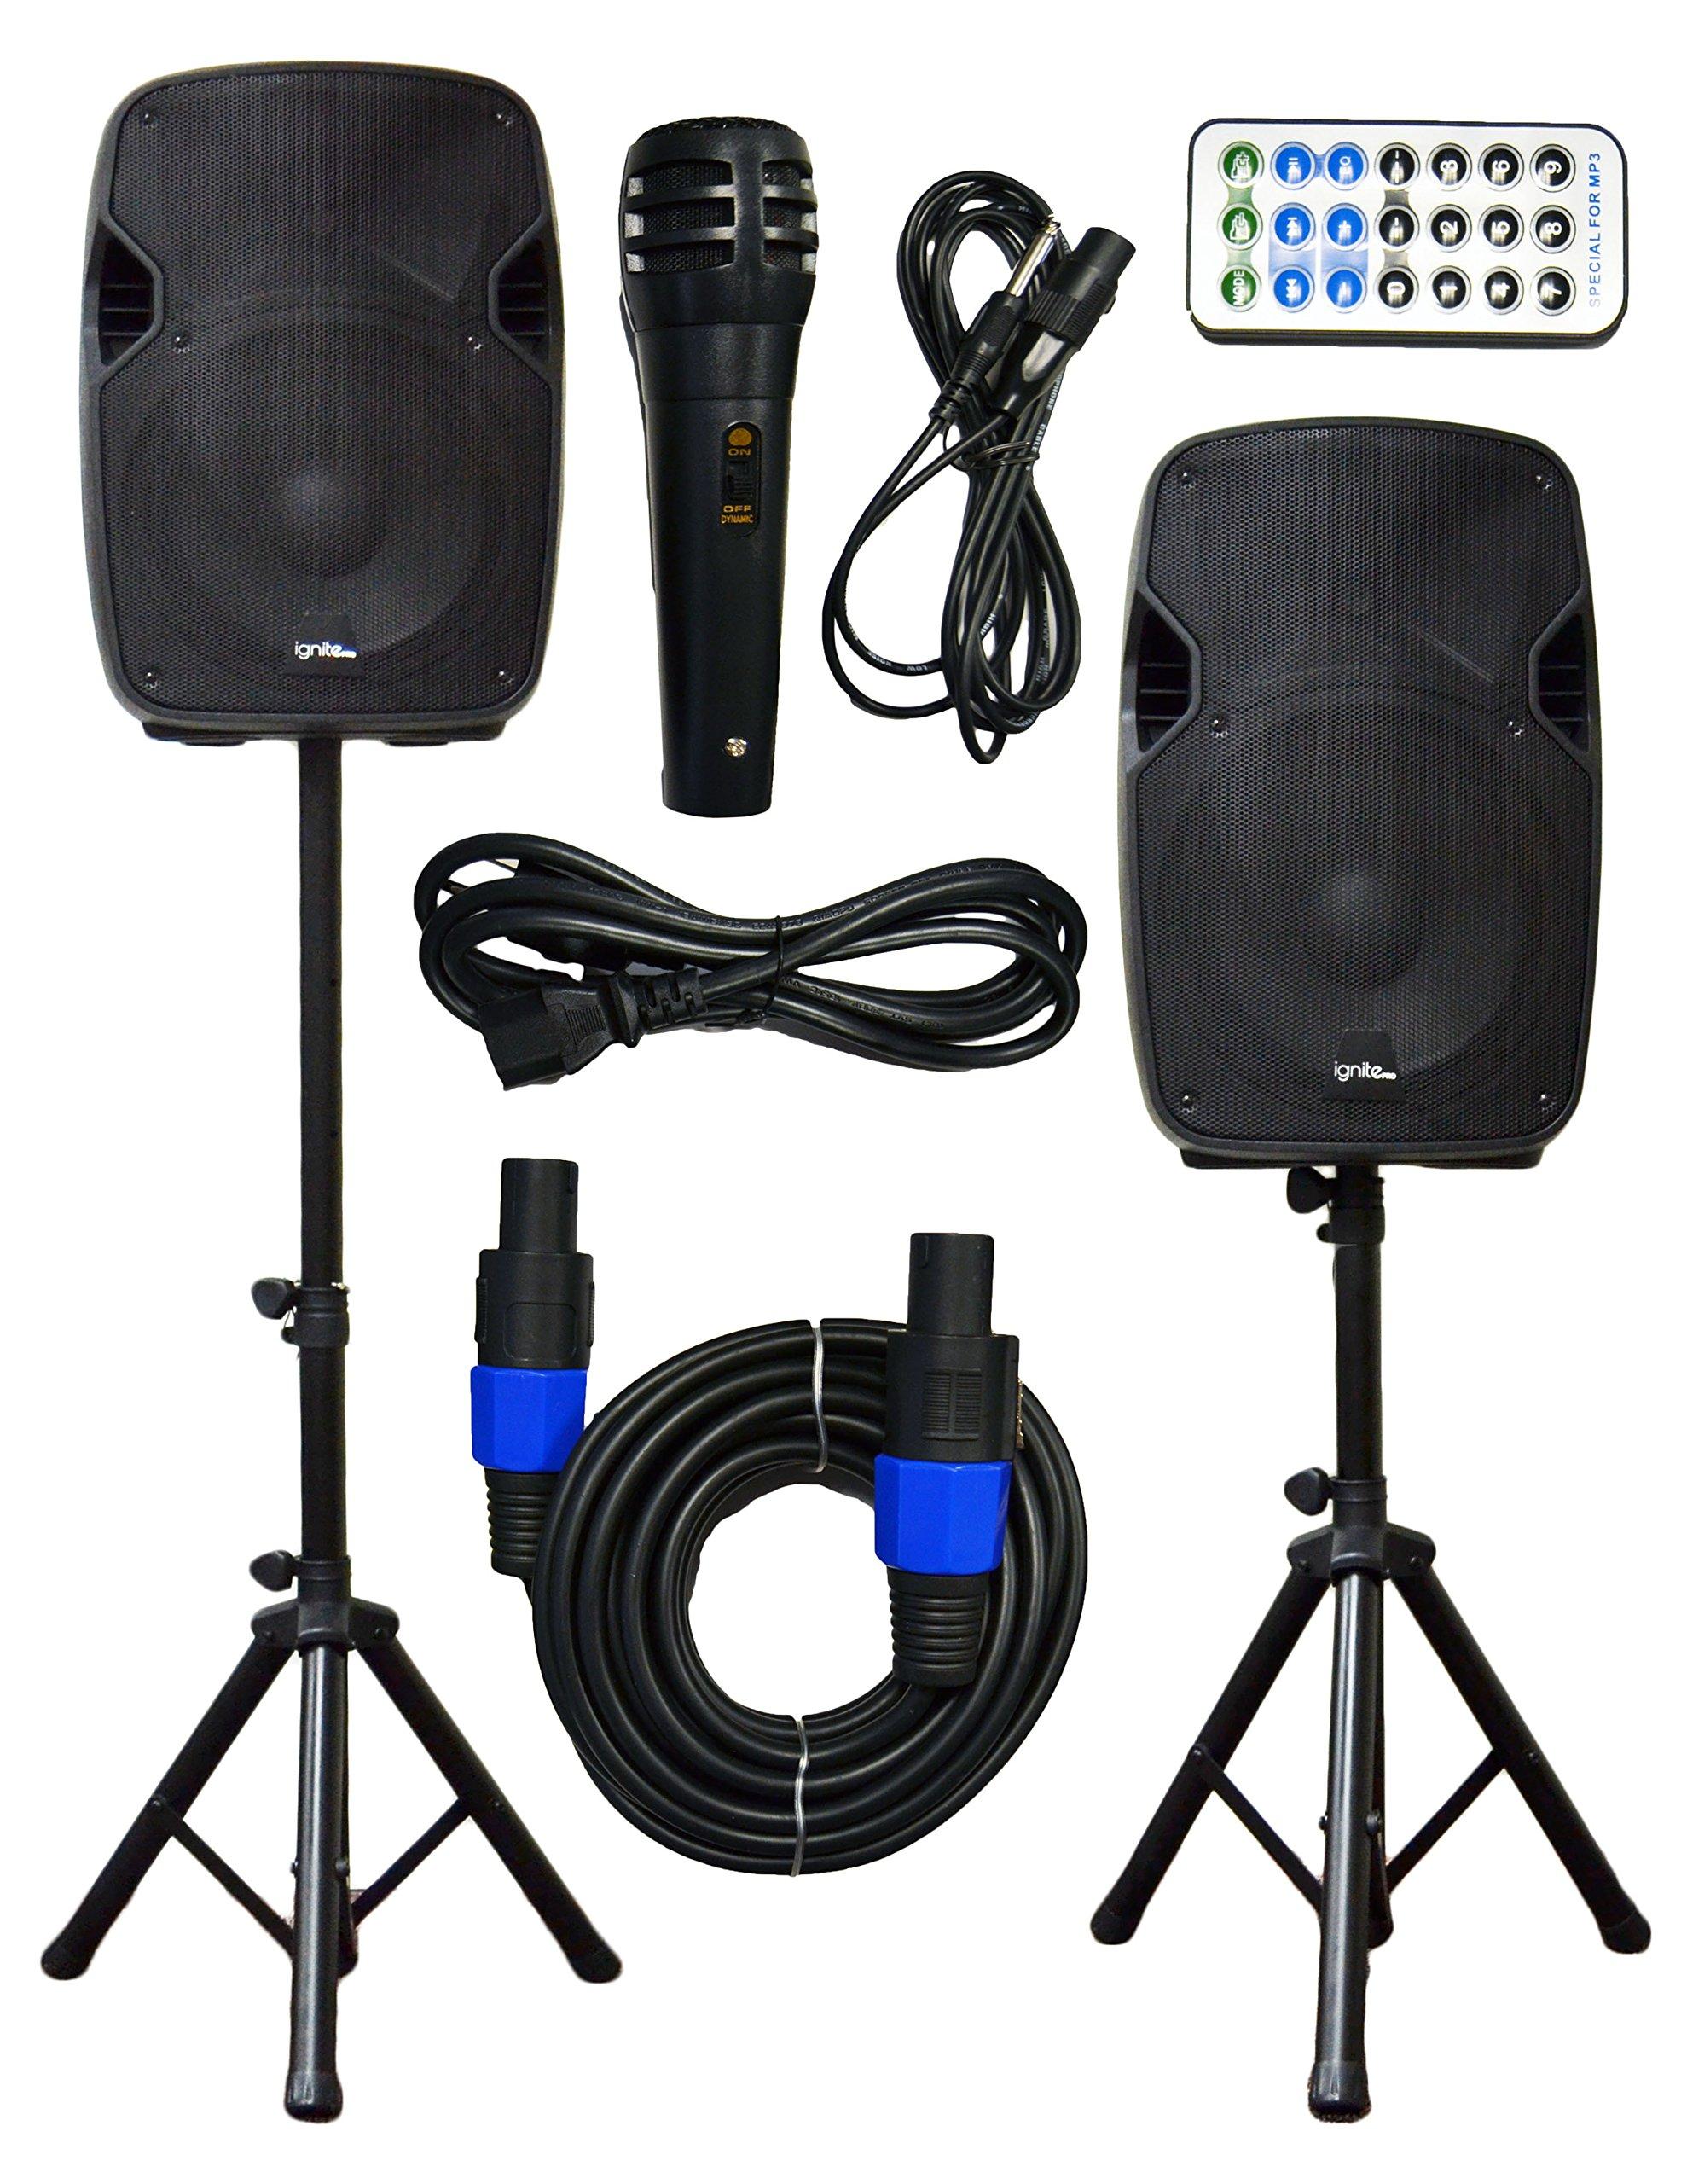 2x Ignite Pro 12'' Pro Series Speaker DJ / PA System / Bluetooth Connectivity 2000W (12'')